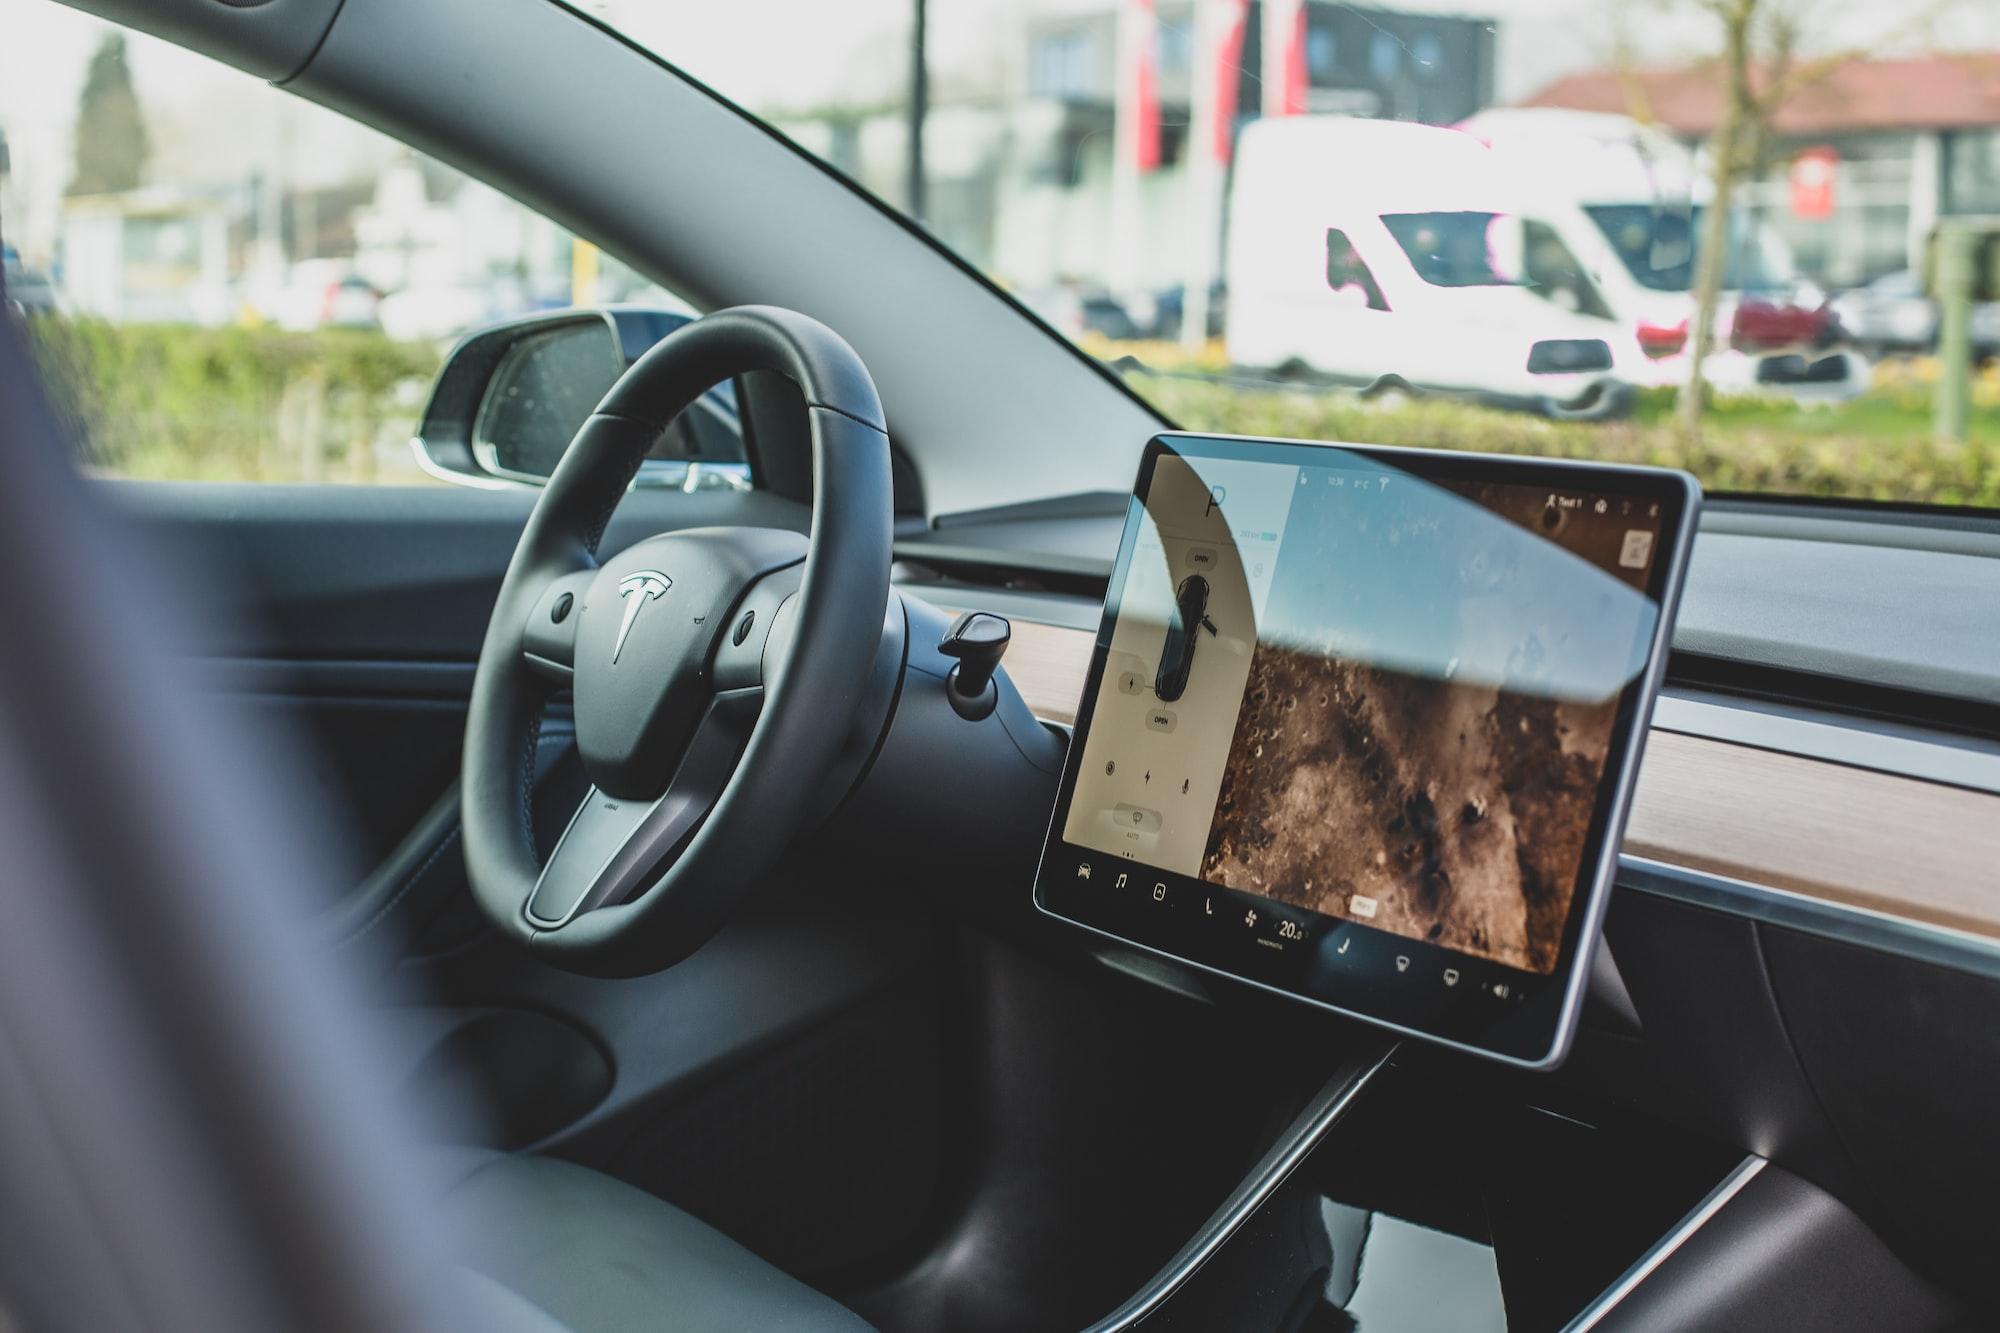 Tesla Autopilot is not dangerous